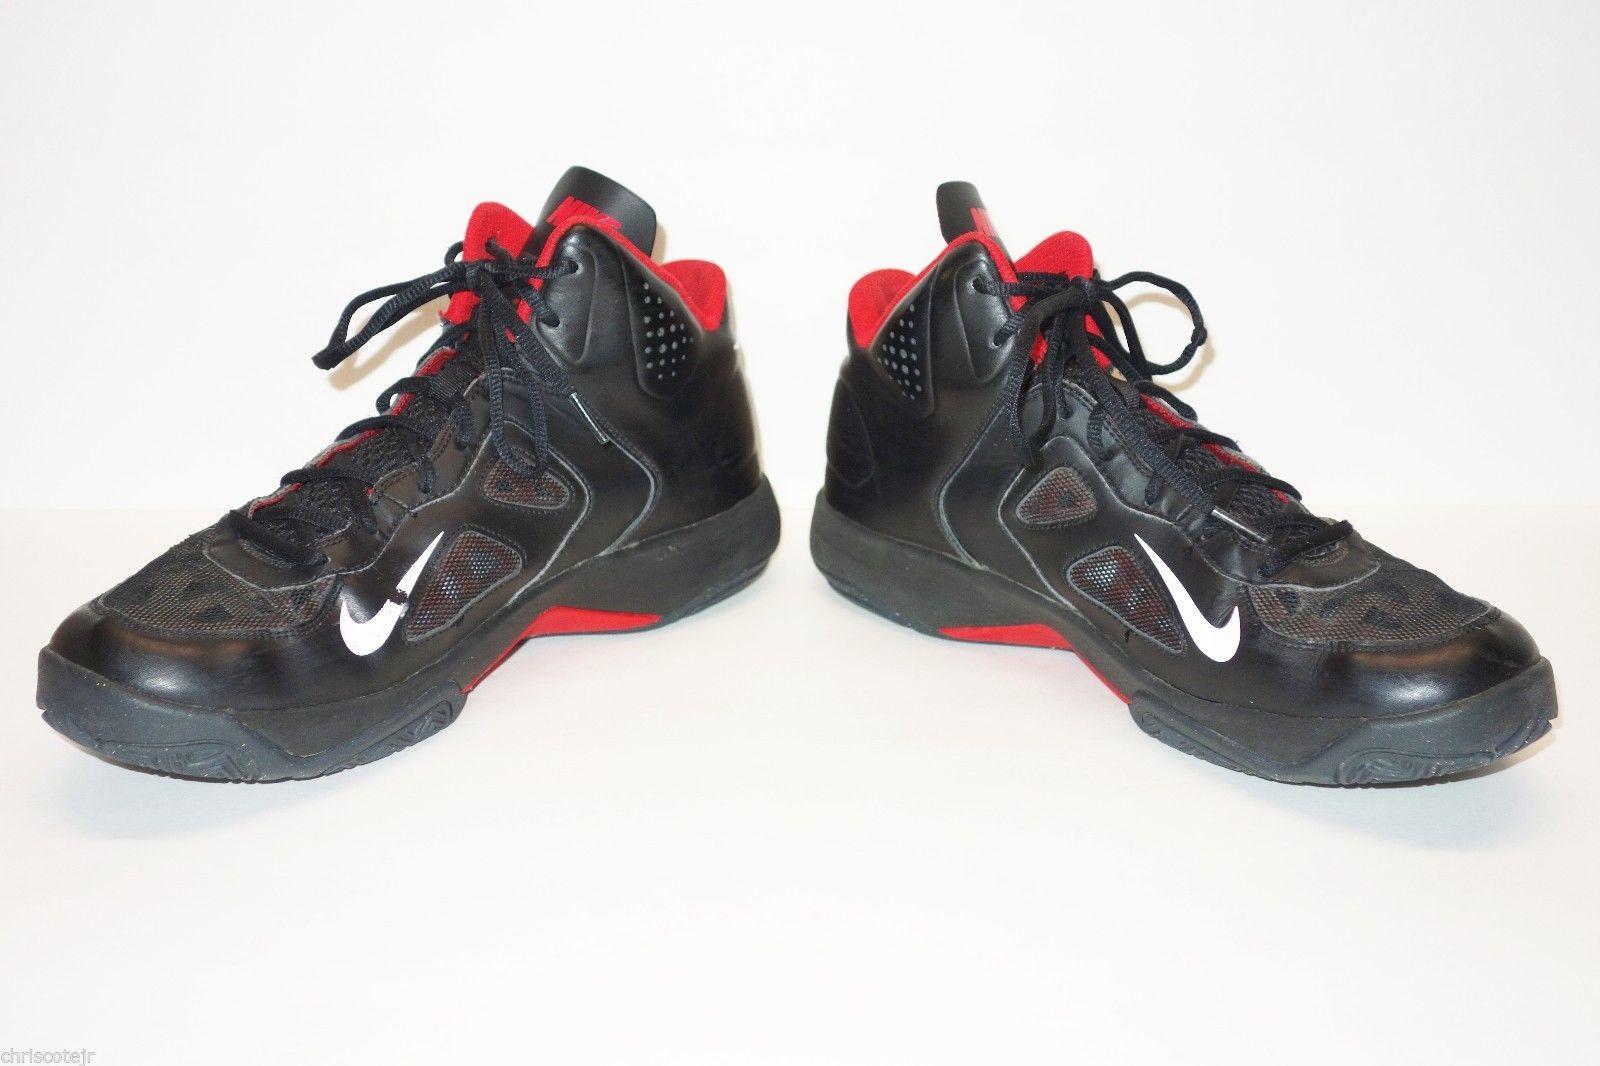 Nike Dual Fusion Black Red Basketball Sneakers Shoes Men's 11 Bulls Heat